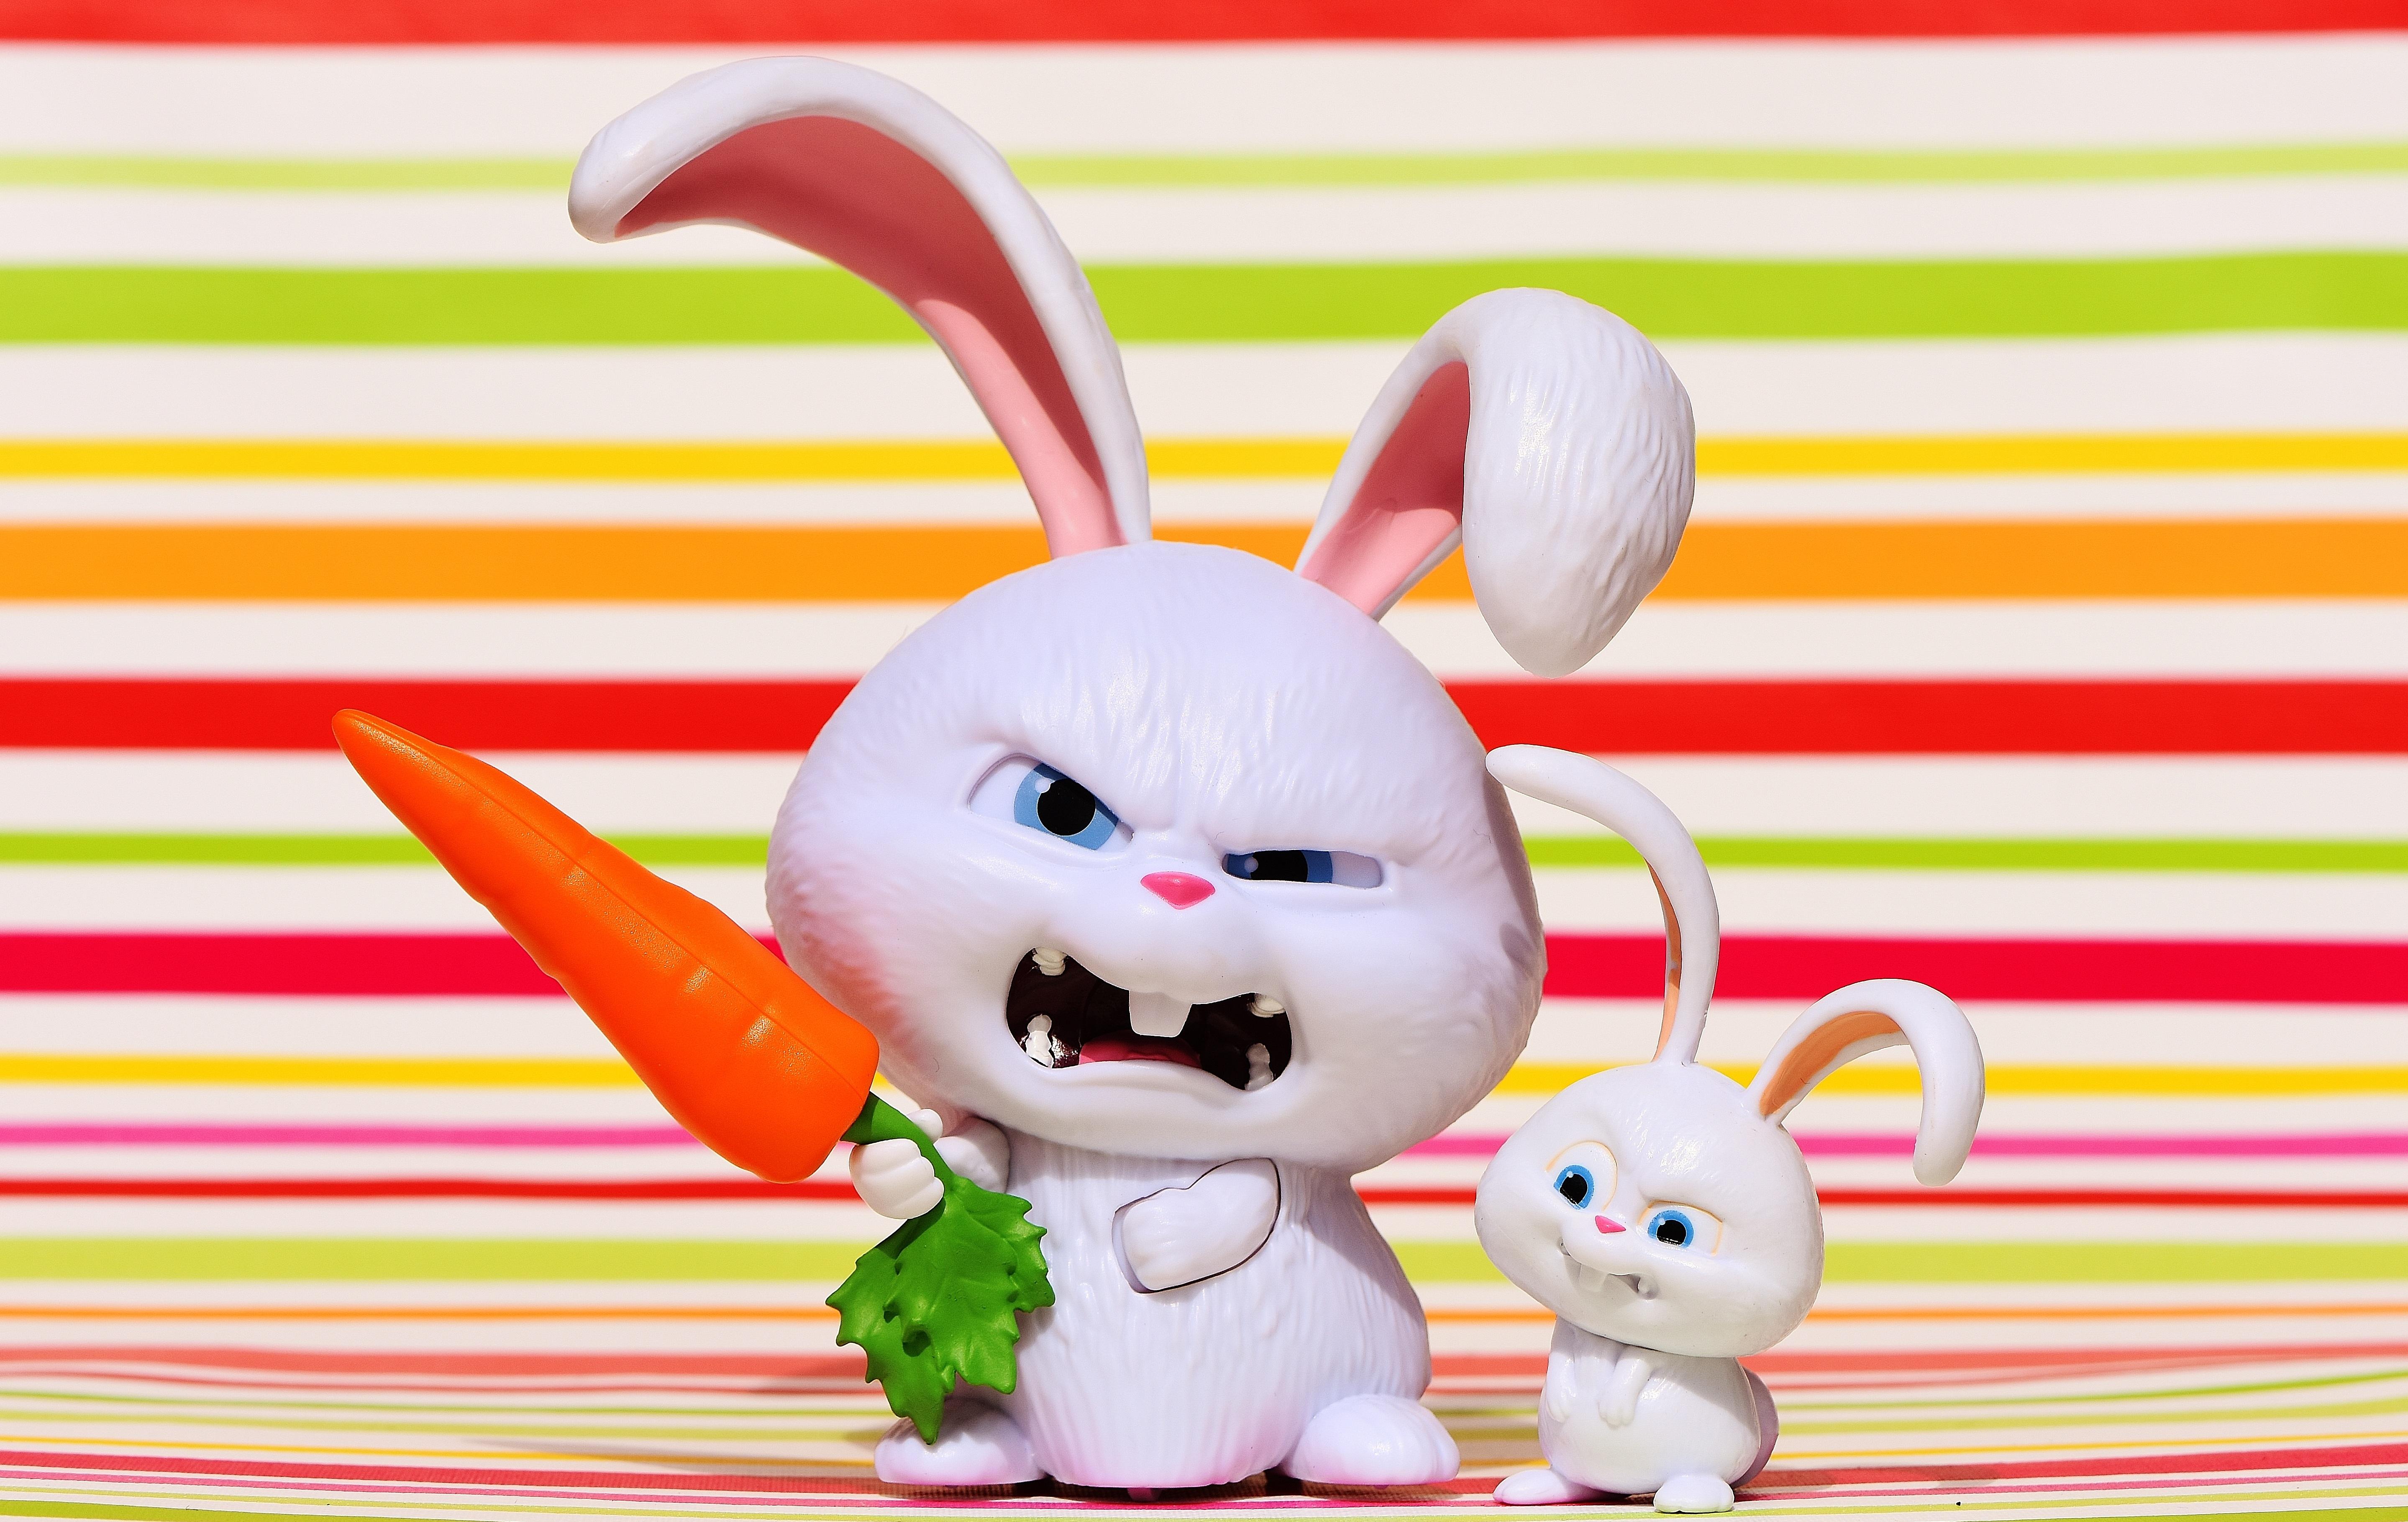 Gambar Imut Makanan Mainan Hewan Peliharaan Anak Anak